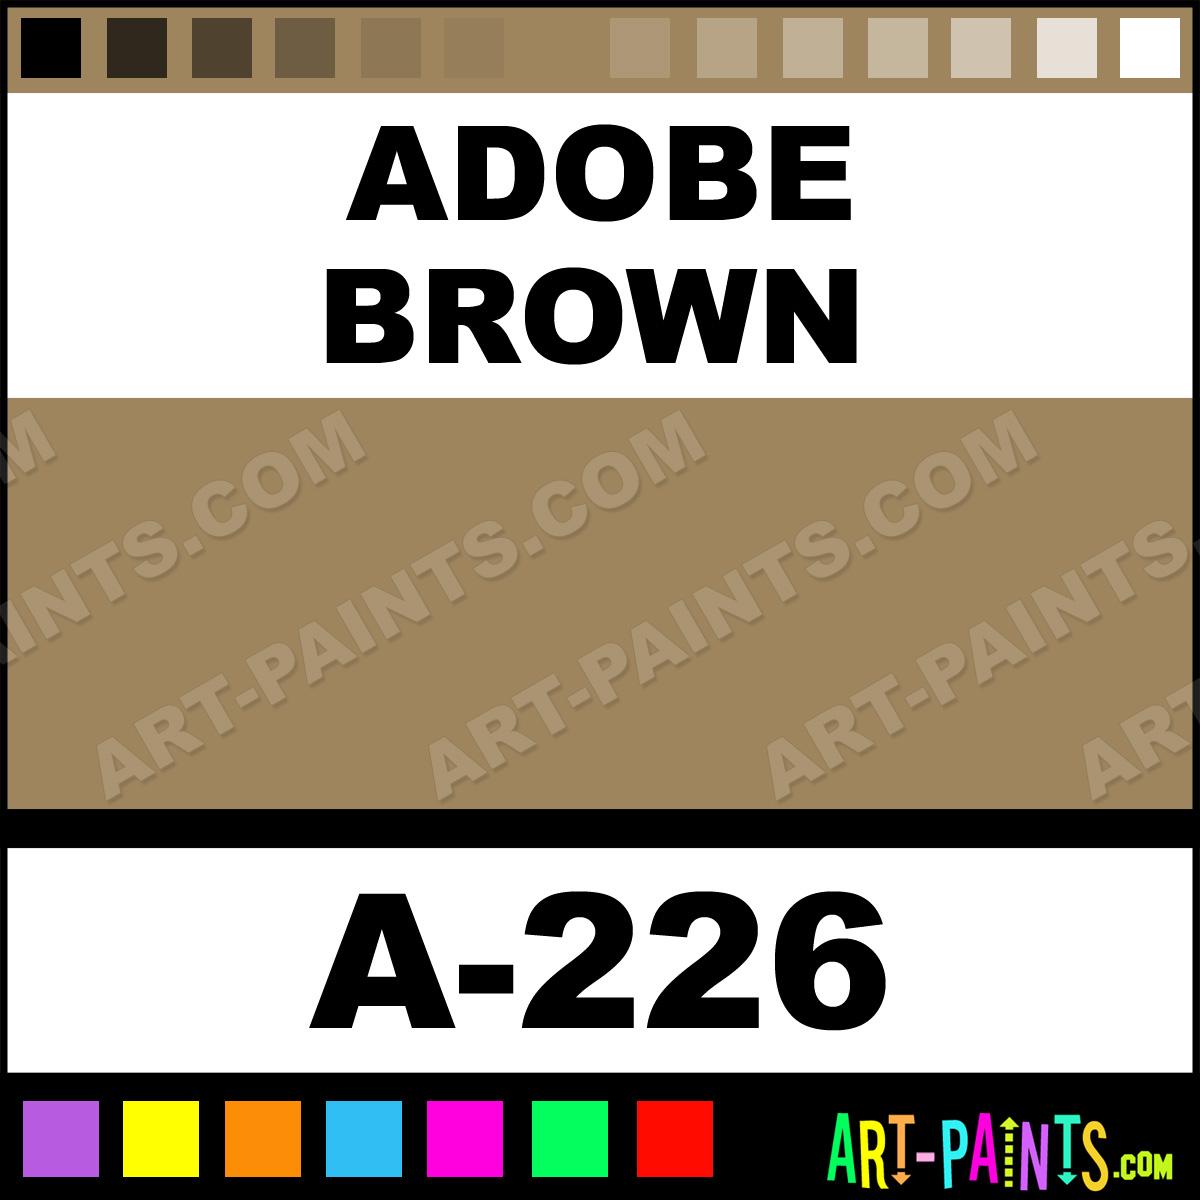 Paint Colors Adobe And Exterior Paint Colors: Adobe Brown Paint, Adobe Brown Color, Donnas Hues